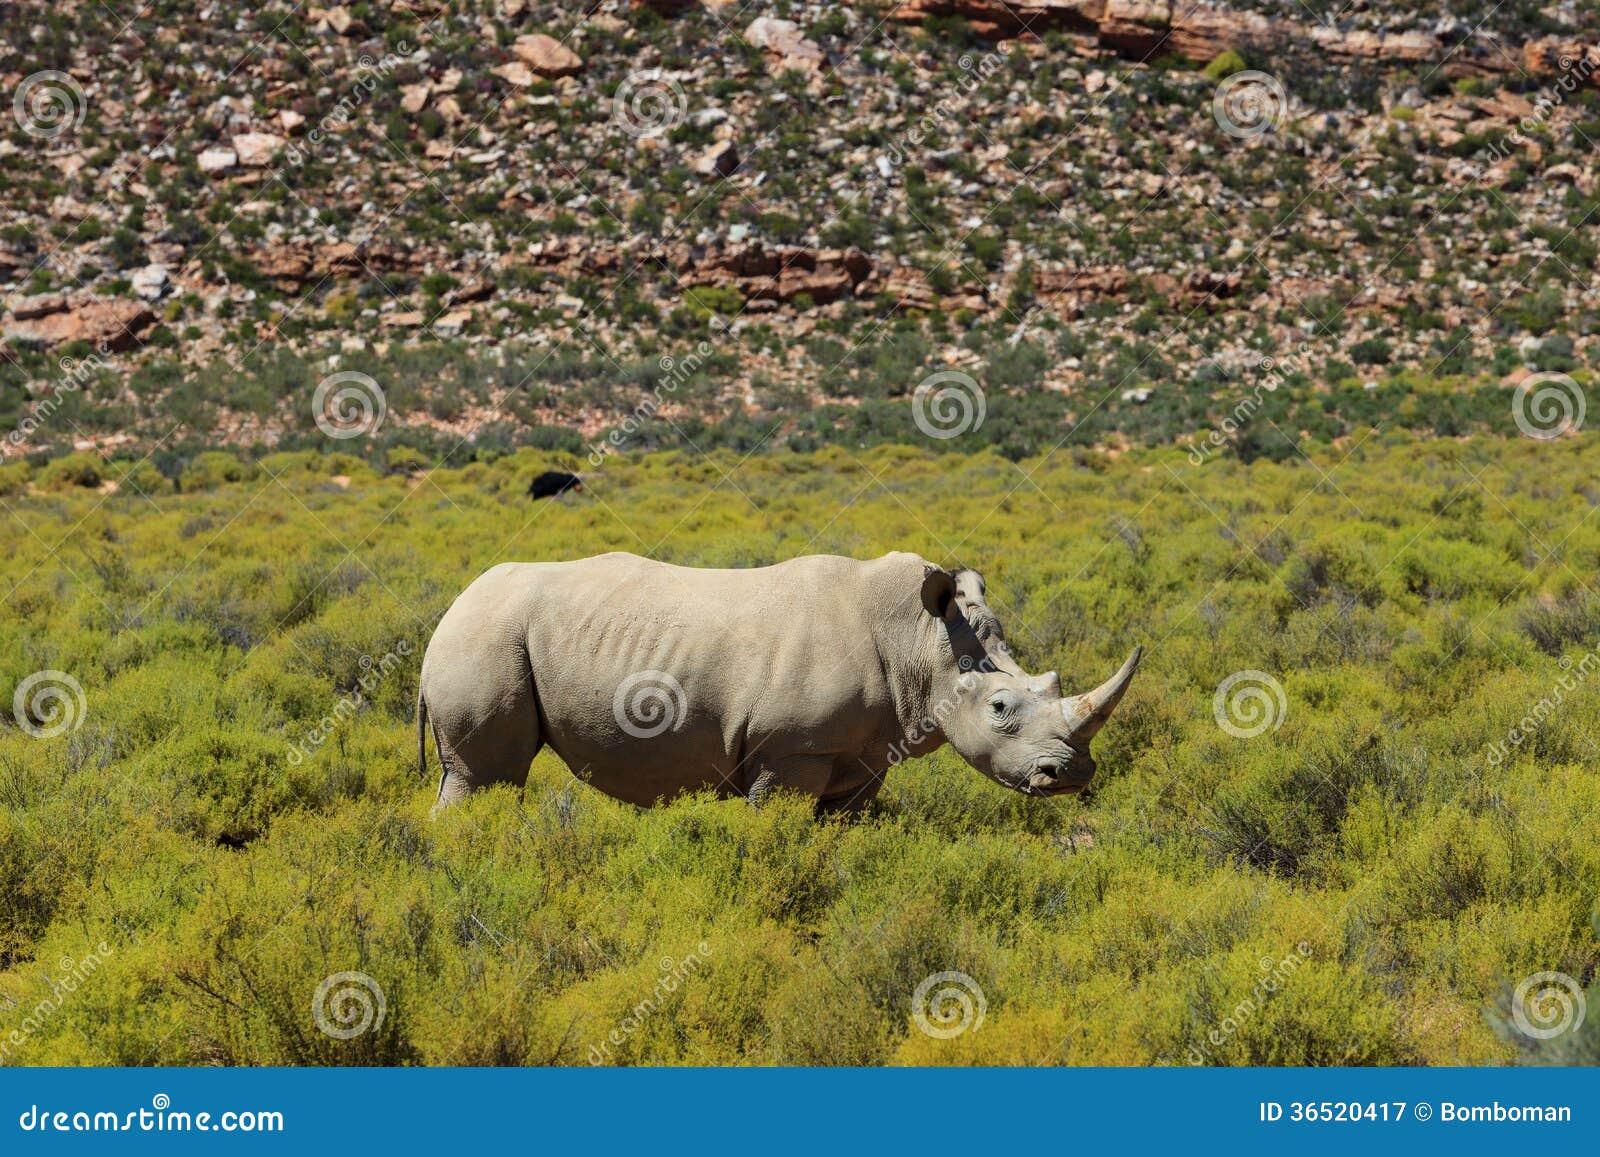 Rhinocéros en parc national de Kruger